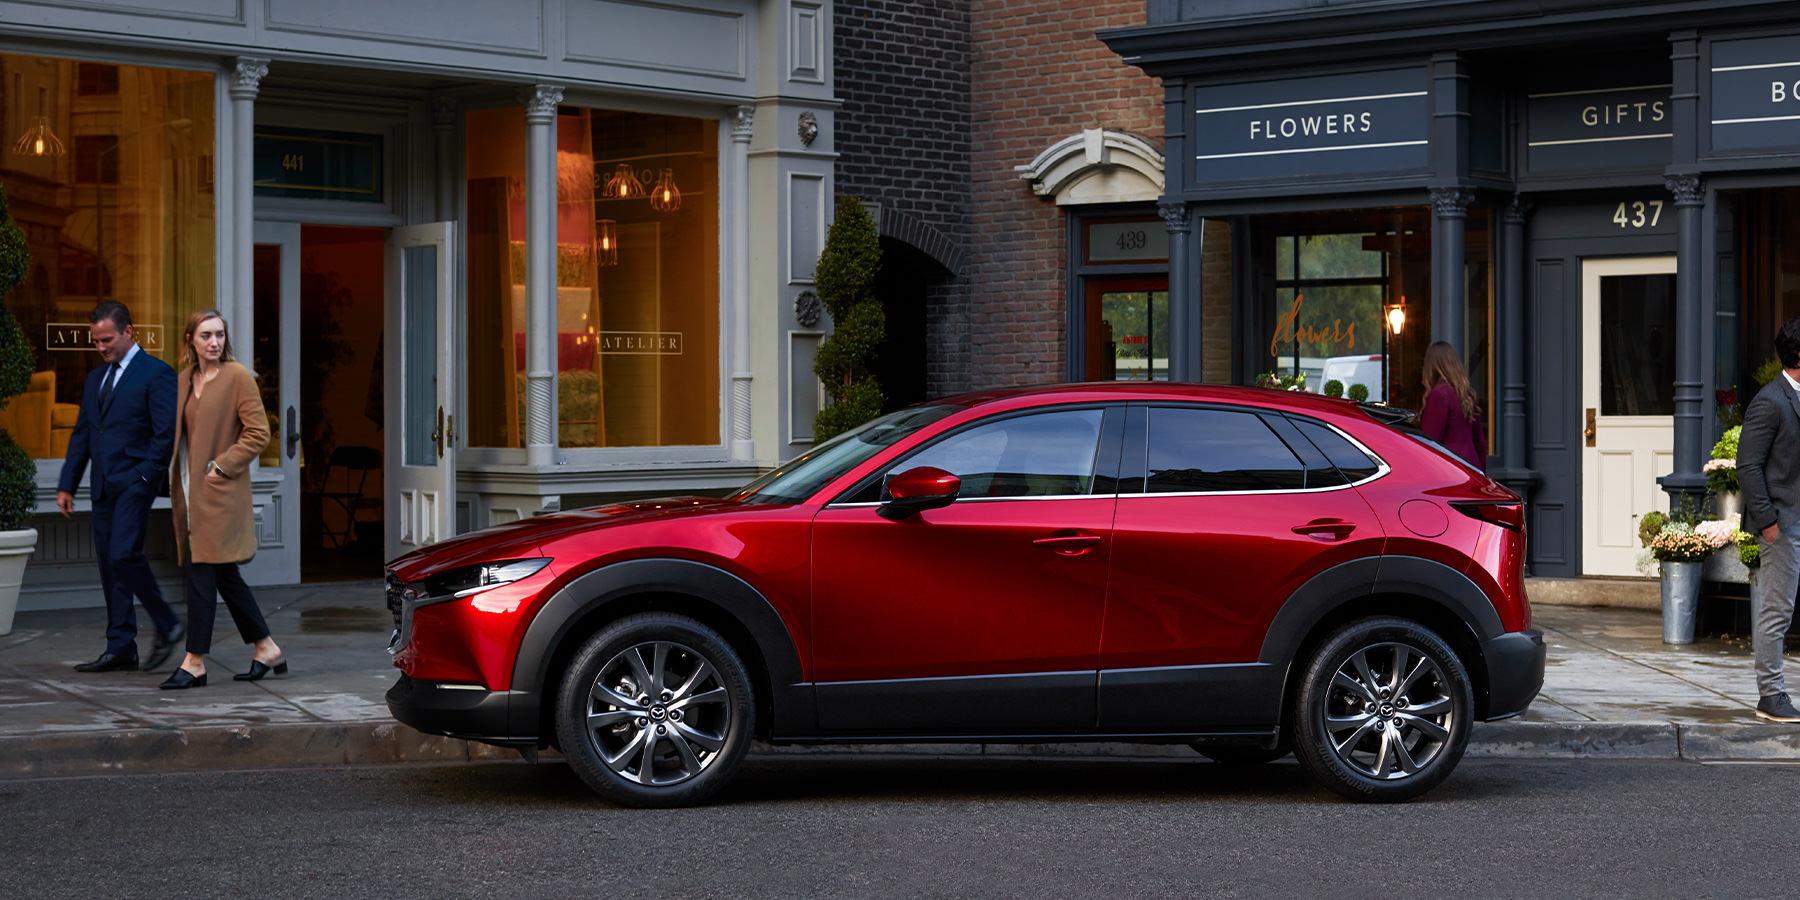 Mazda UK | Explore our full range of cars & latest offers